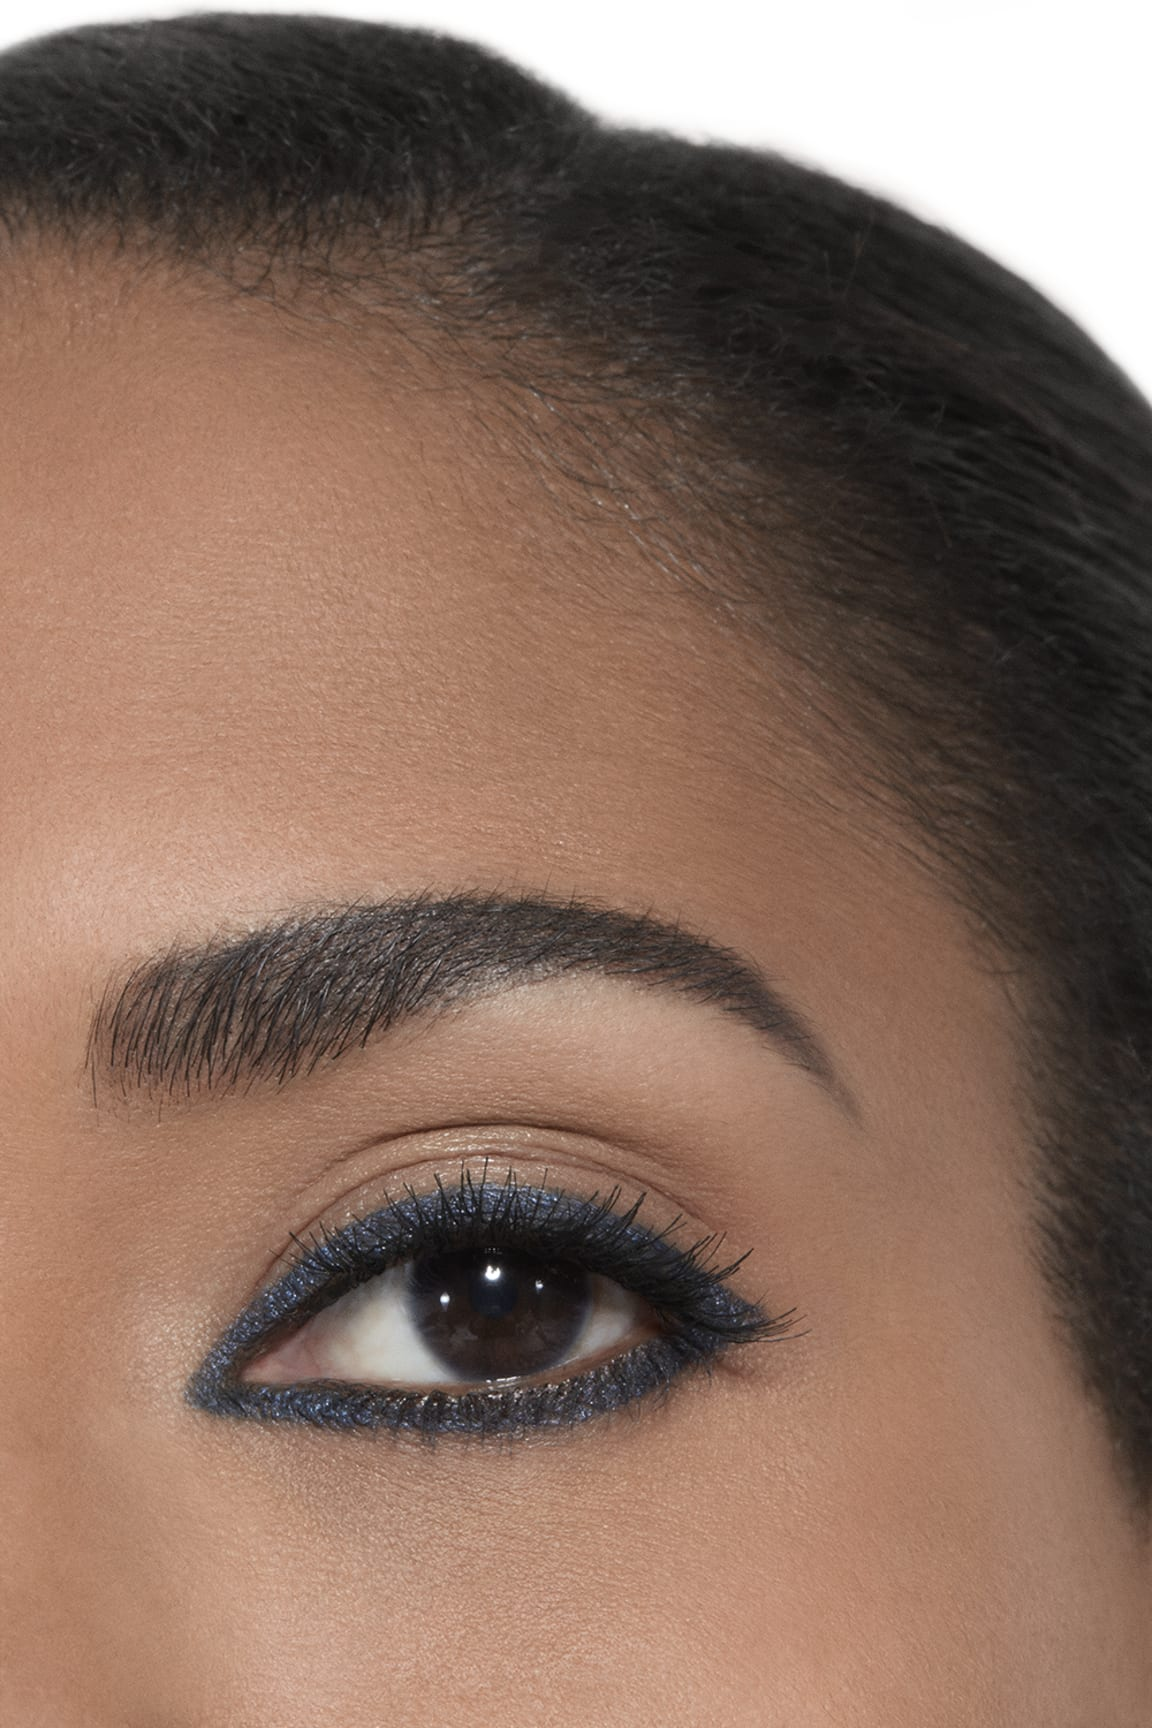 Anwendung Make-up-Bild 2 - STYLO YEUX WATERPROOF 30 - MARINE